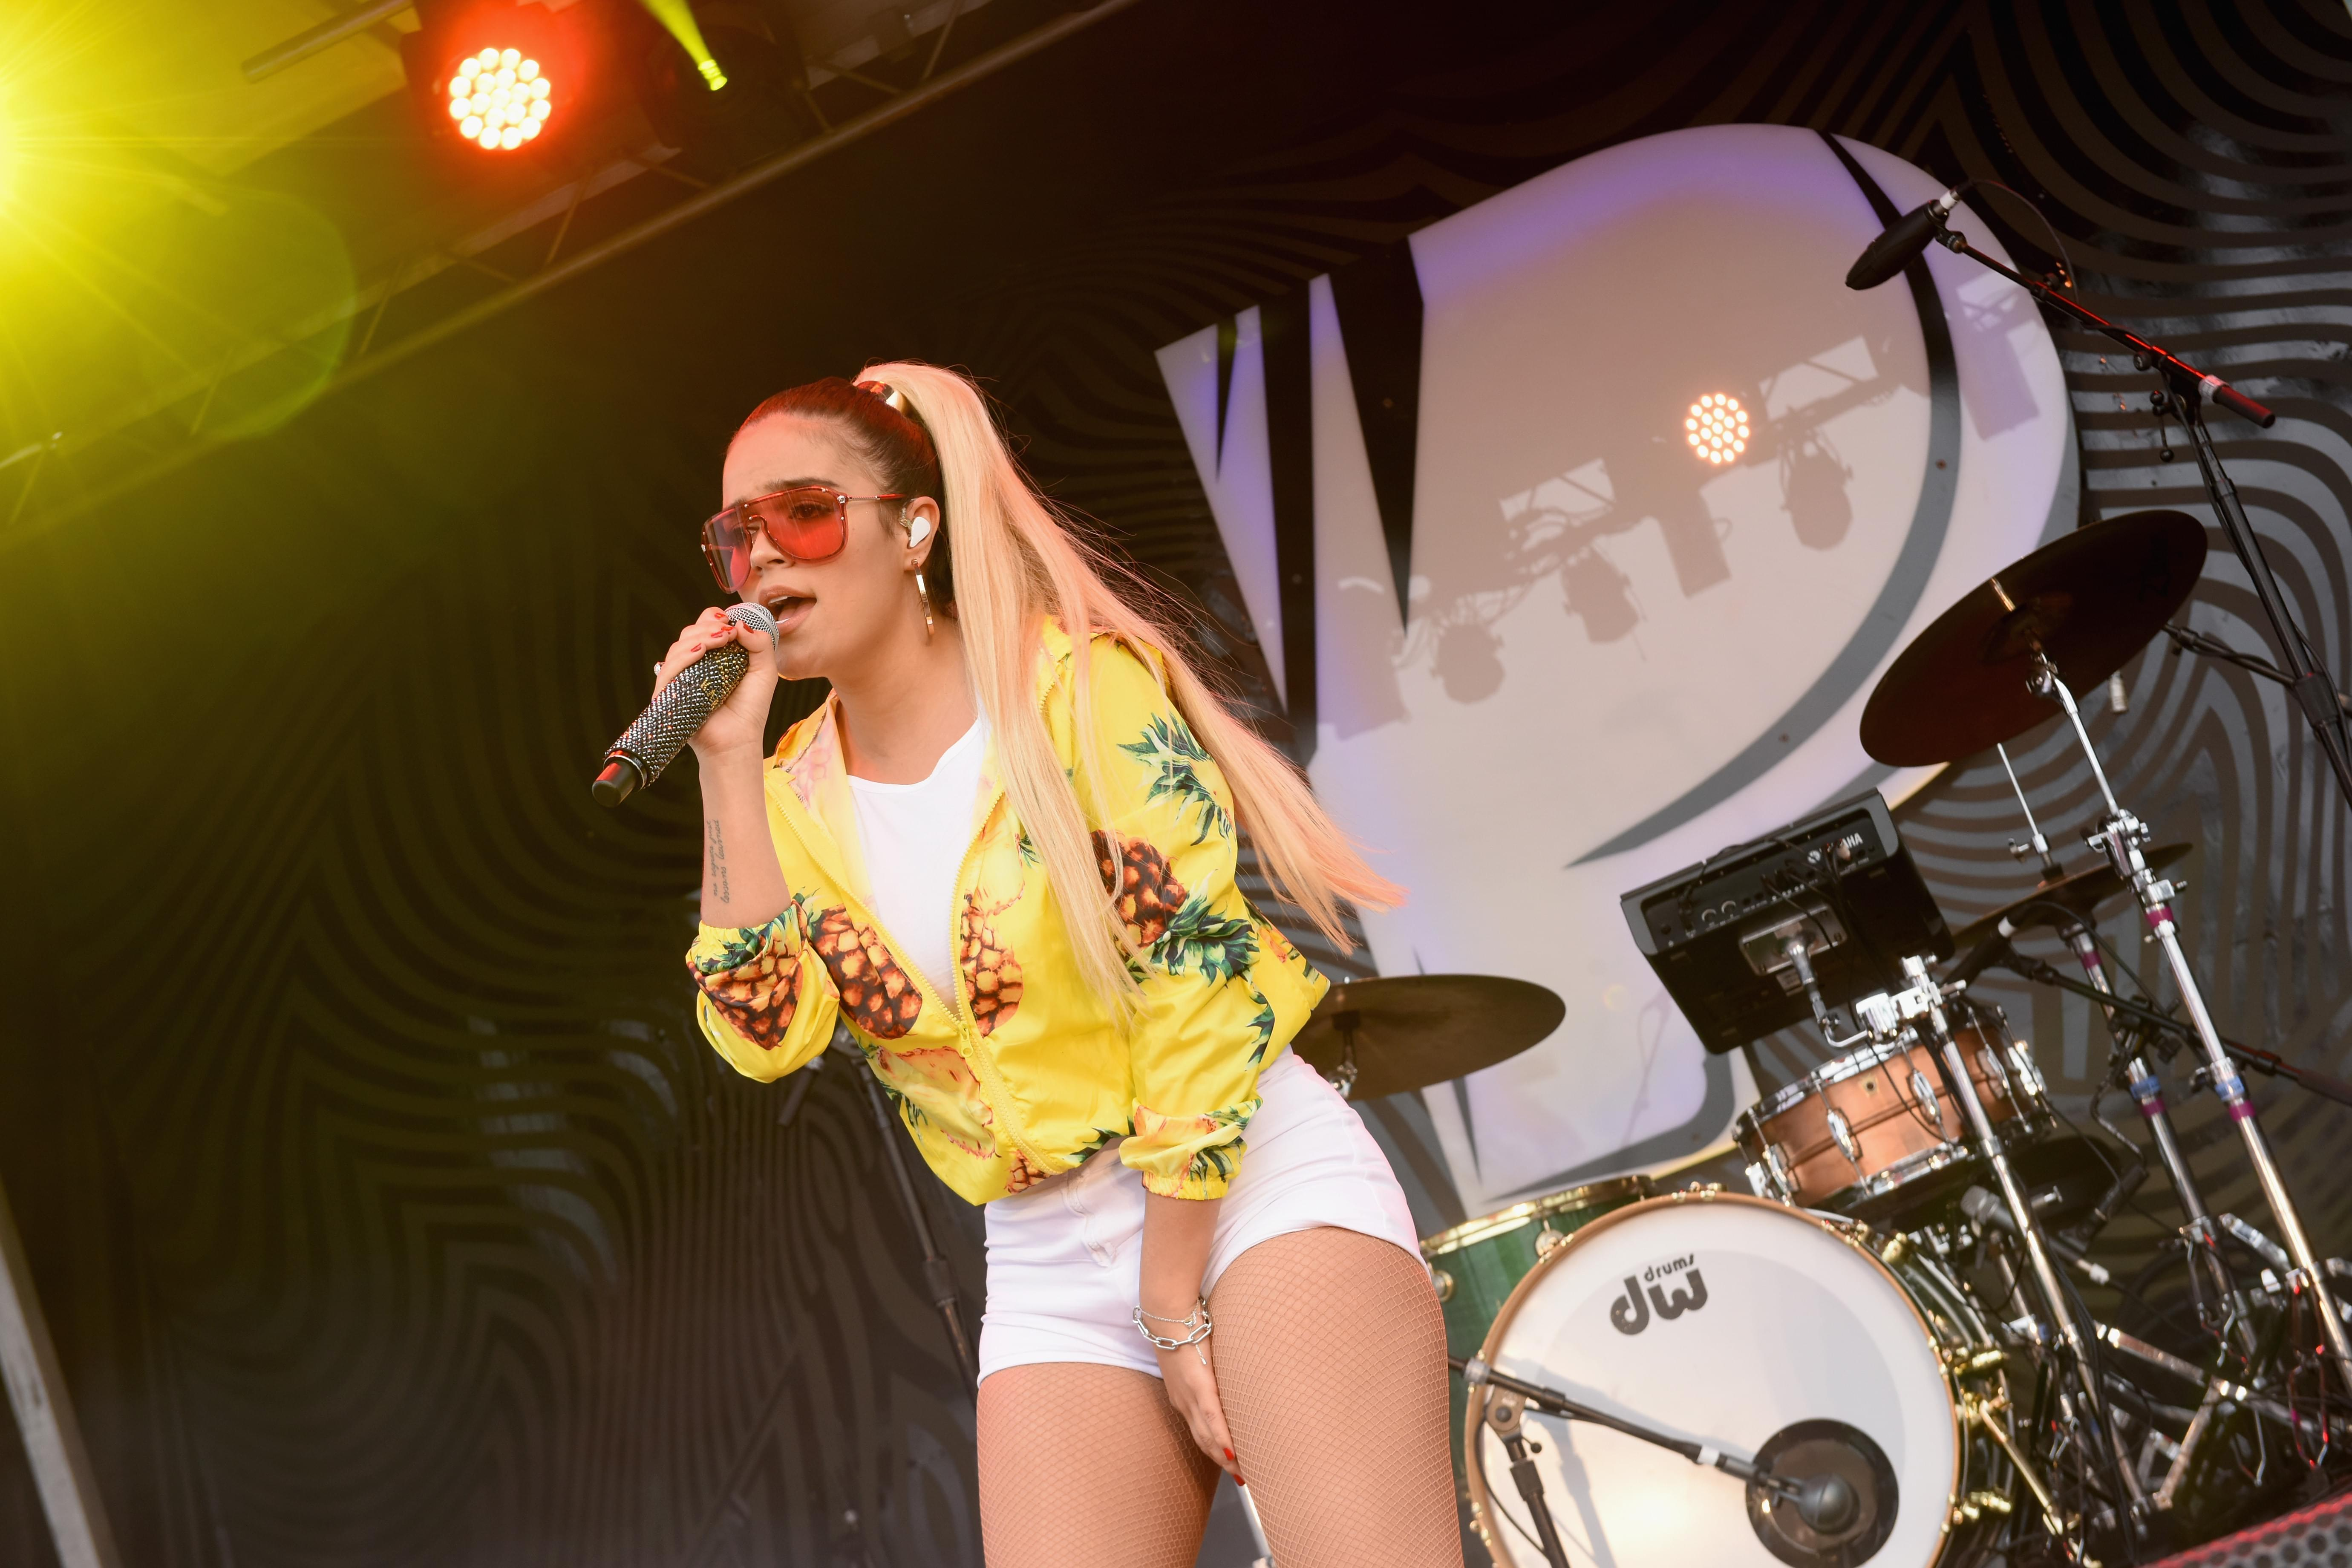 34f4ac4f4cdc1 Karol G Released 'Pineapple' Music Video | KPWR-FM